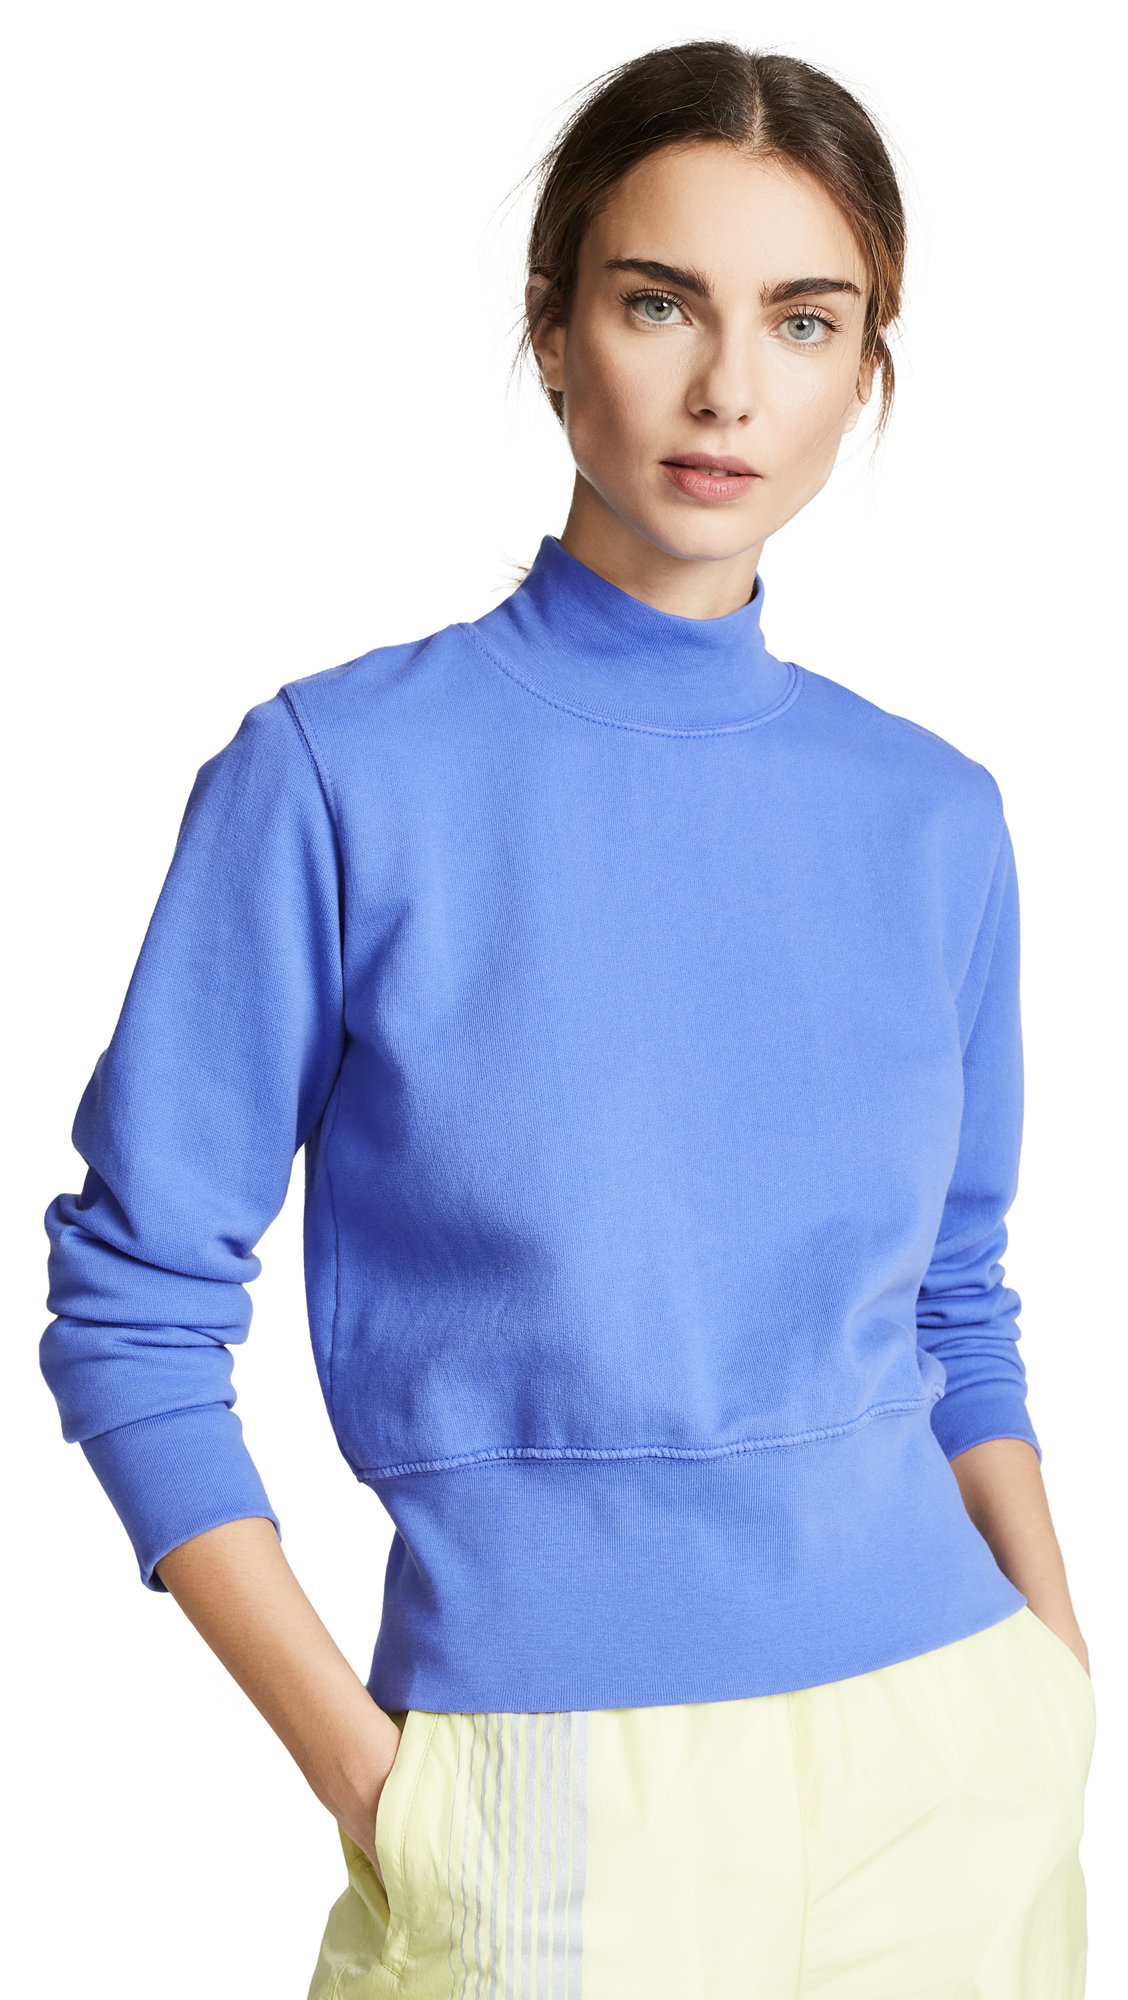 Milan Sweatshirt in Lavender